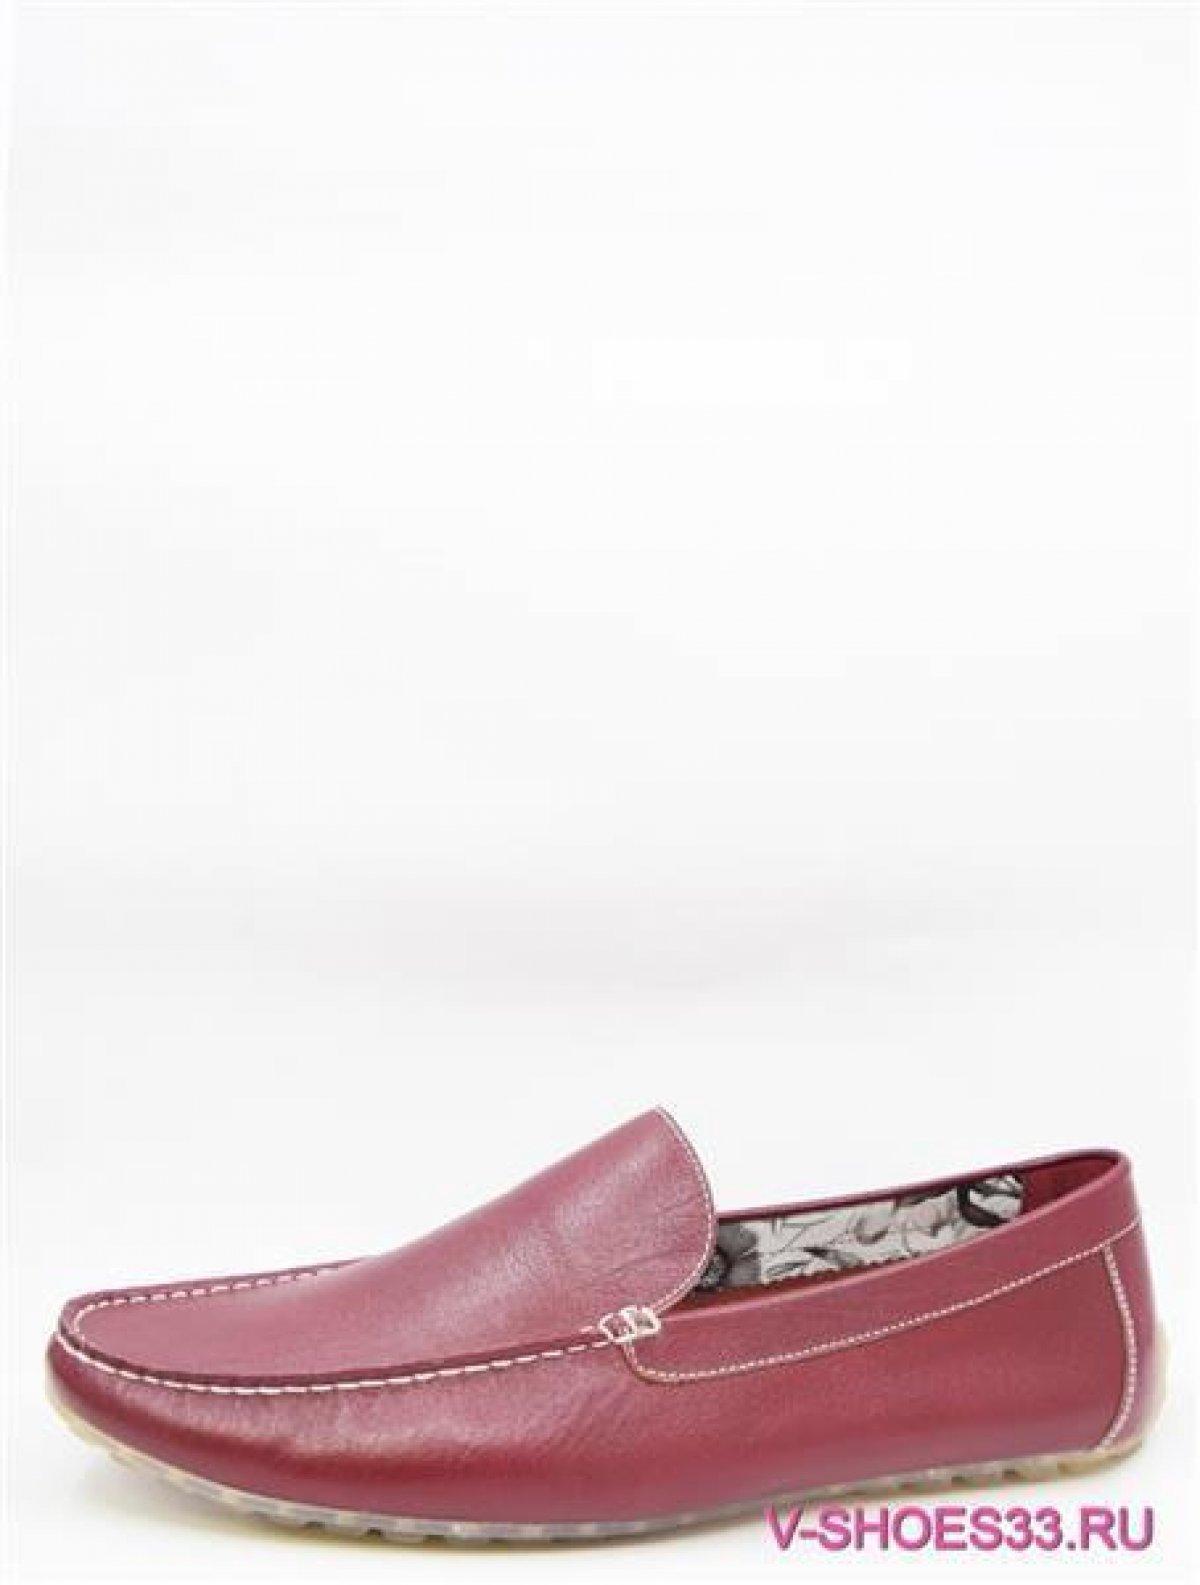 K87-075390 туфли мужские